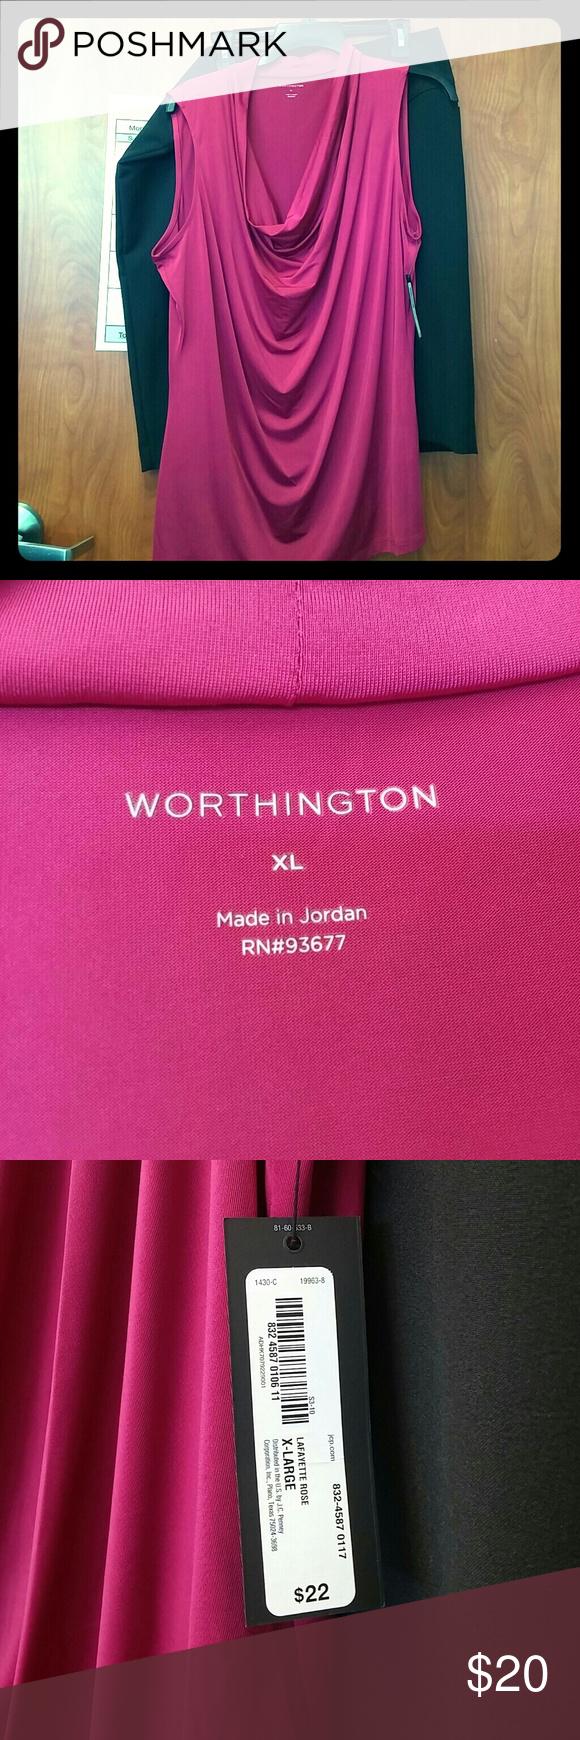 Worthington sleeveless dress shirt Fuschia scoop/cowl neck sleeveless dress/casual shirt by Worthington XL NWT  Open to Offers! Worthington Tops Blouses